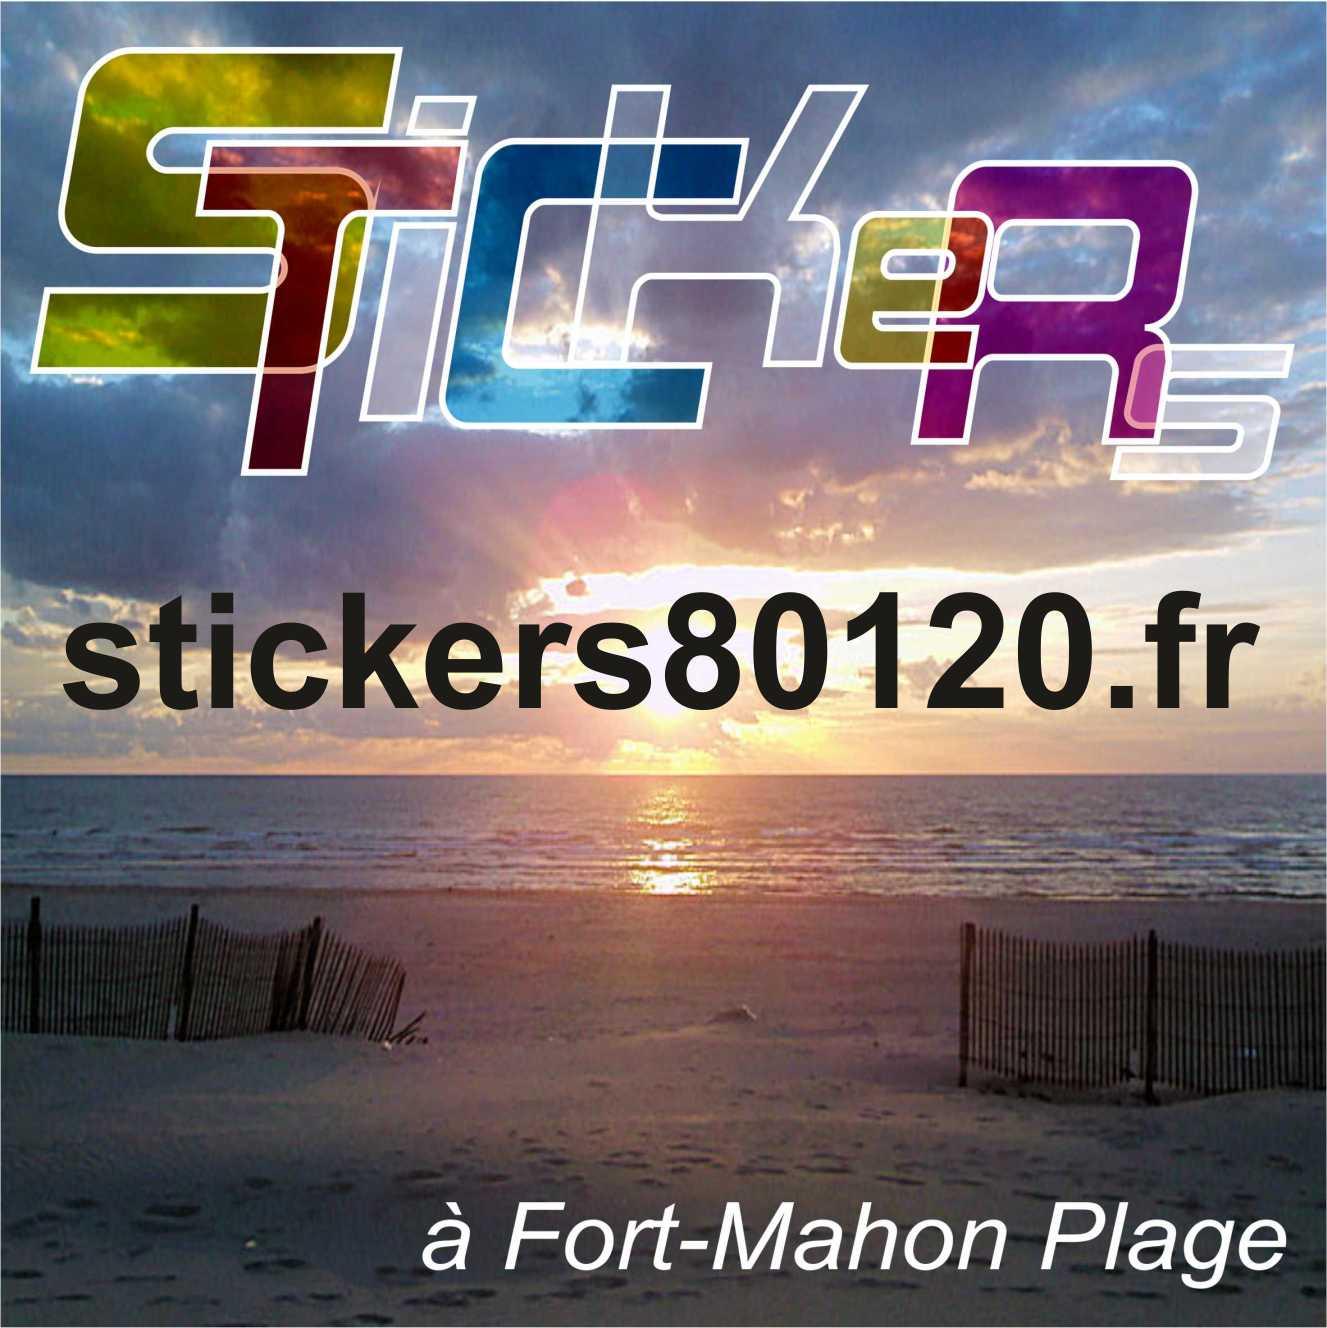 Stickers 80120